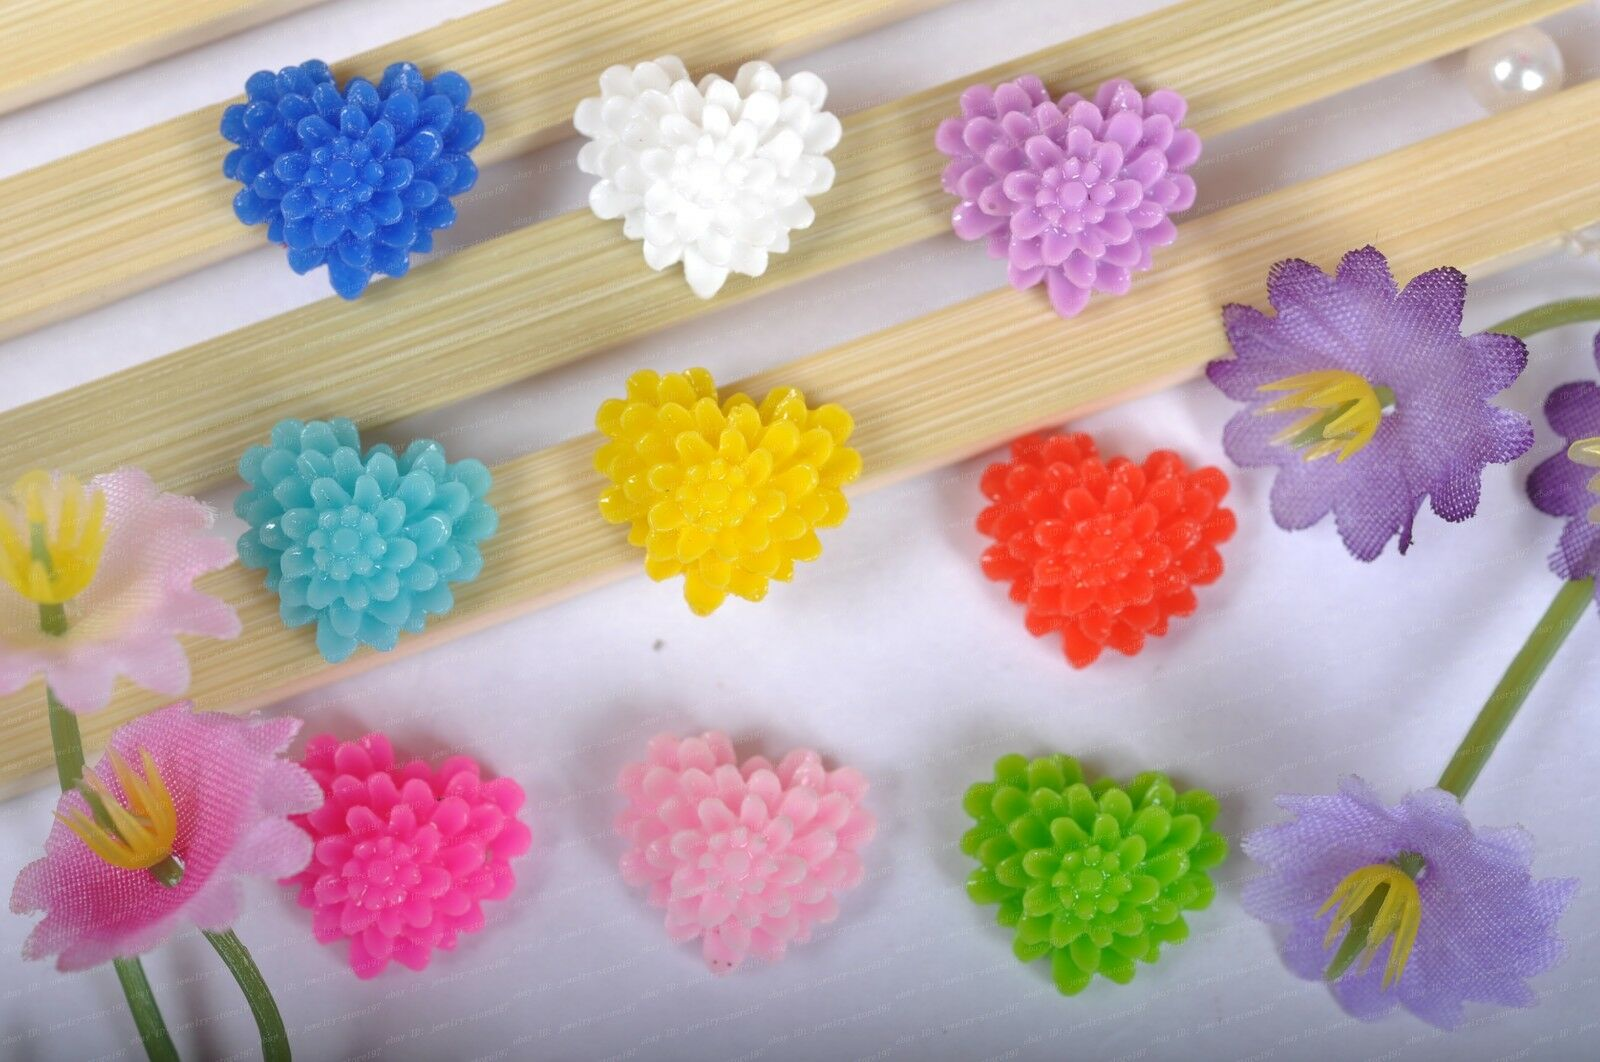 Free Ship  Wholesale  20pcs Resin Flower Flatback Cabochons 17X8MM 10 Colors